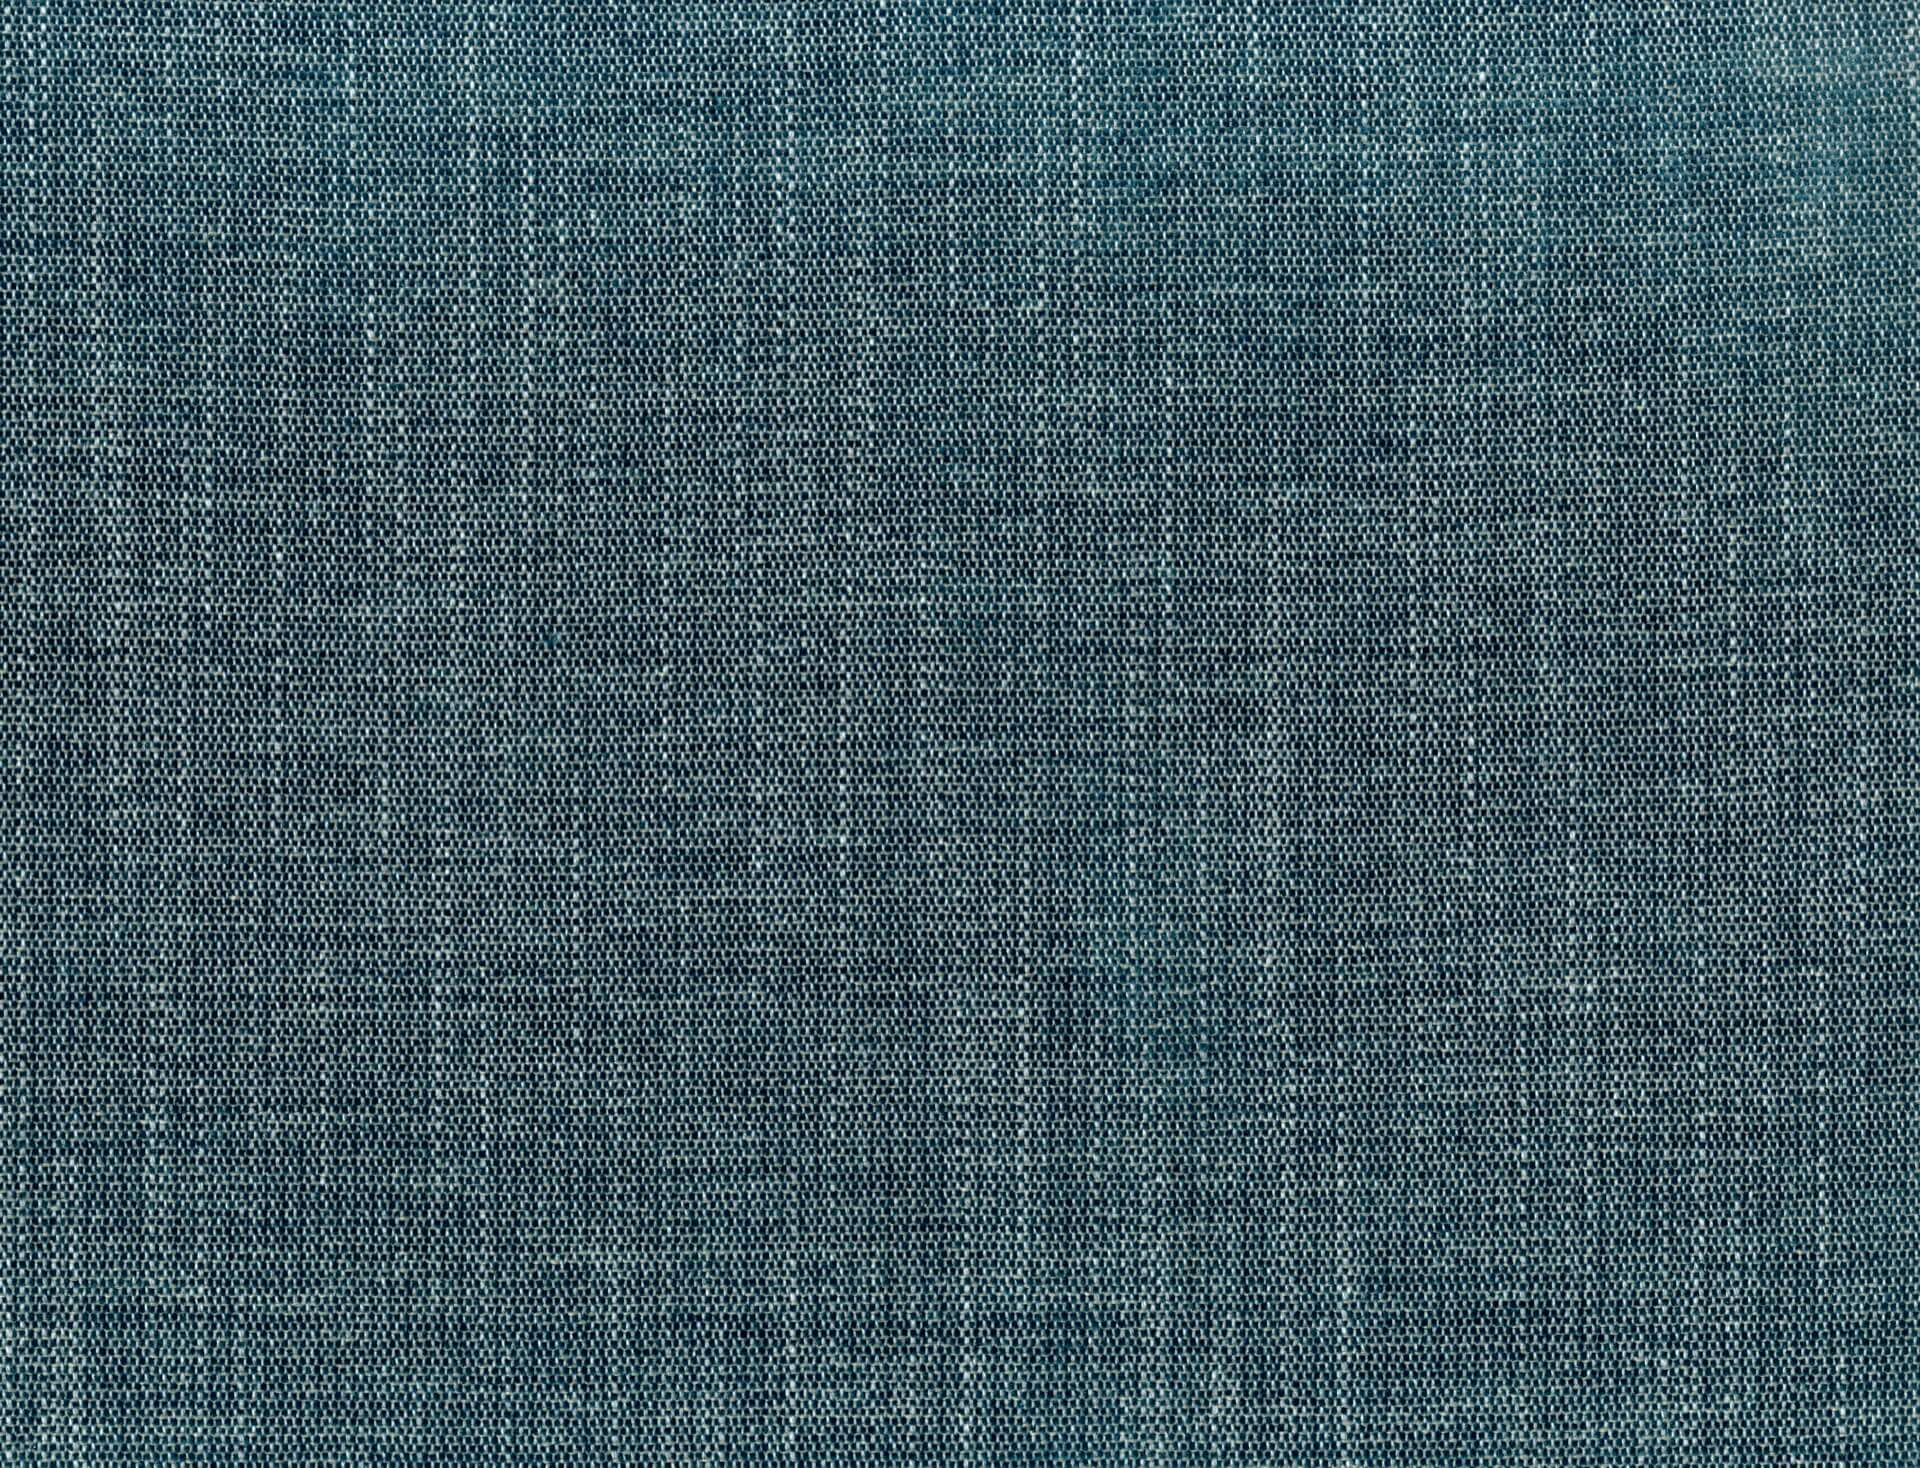 Nori Fabric Turquoise